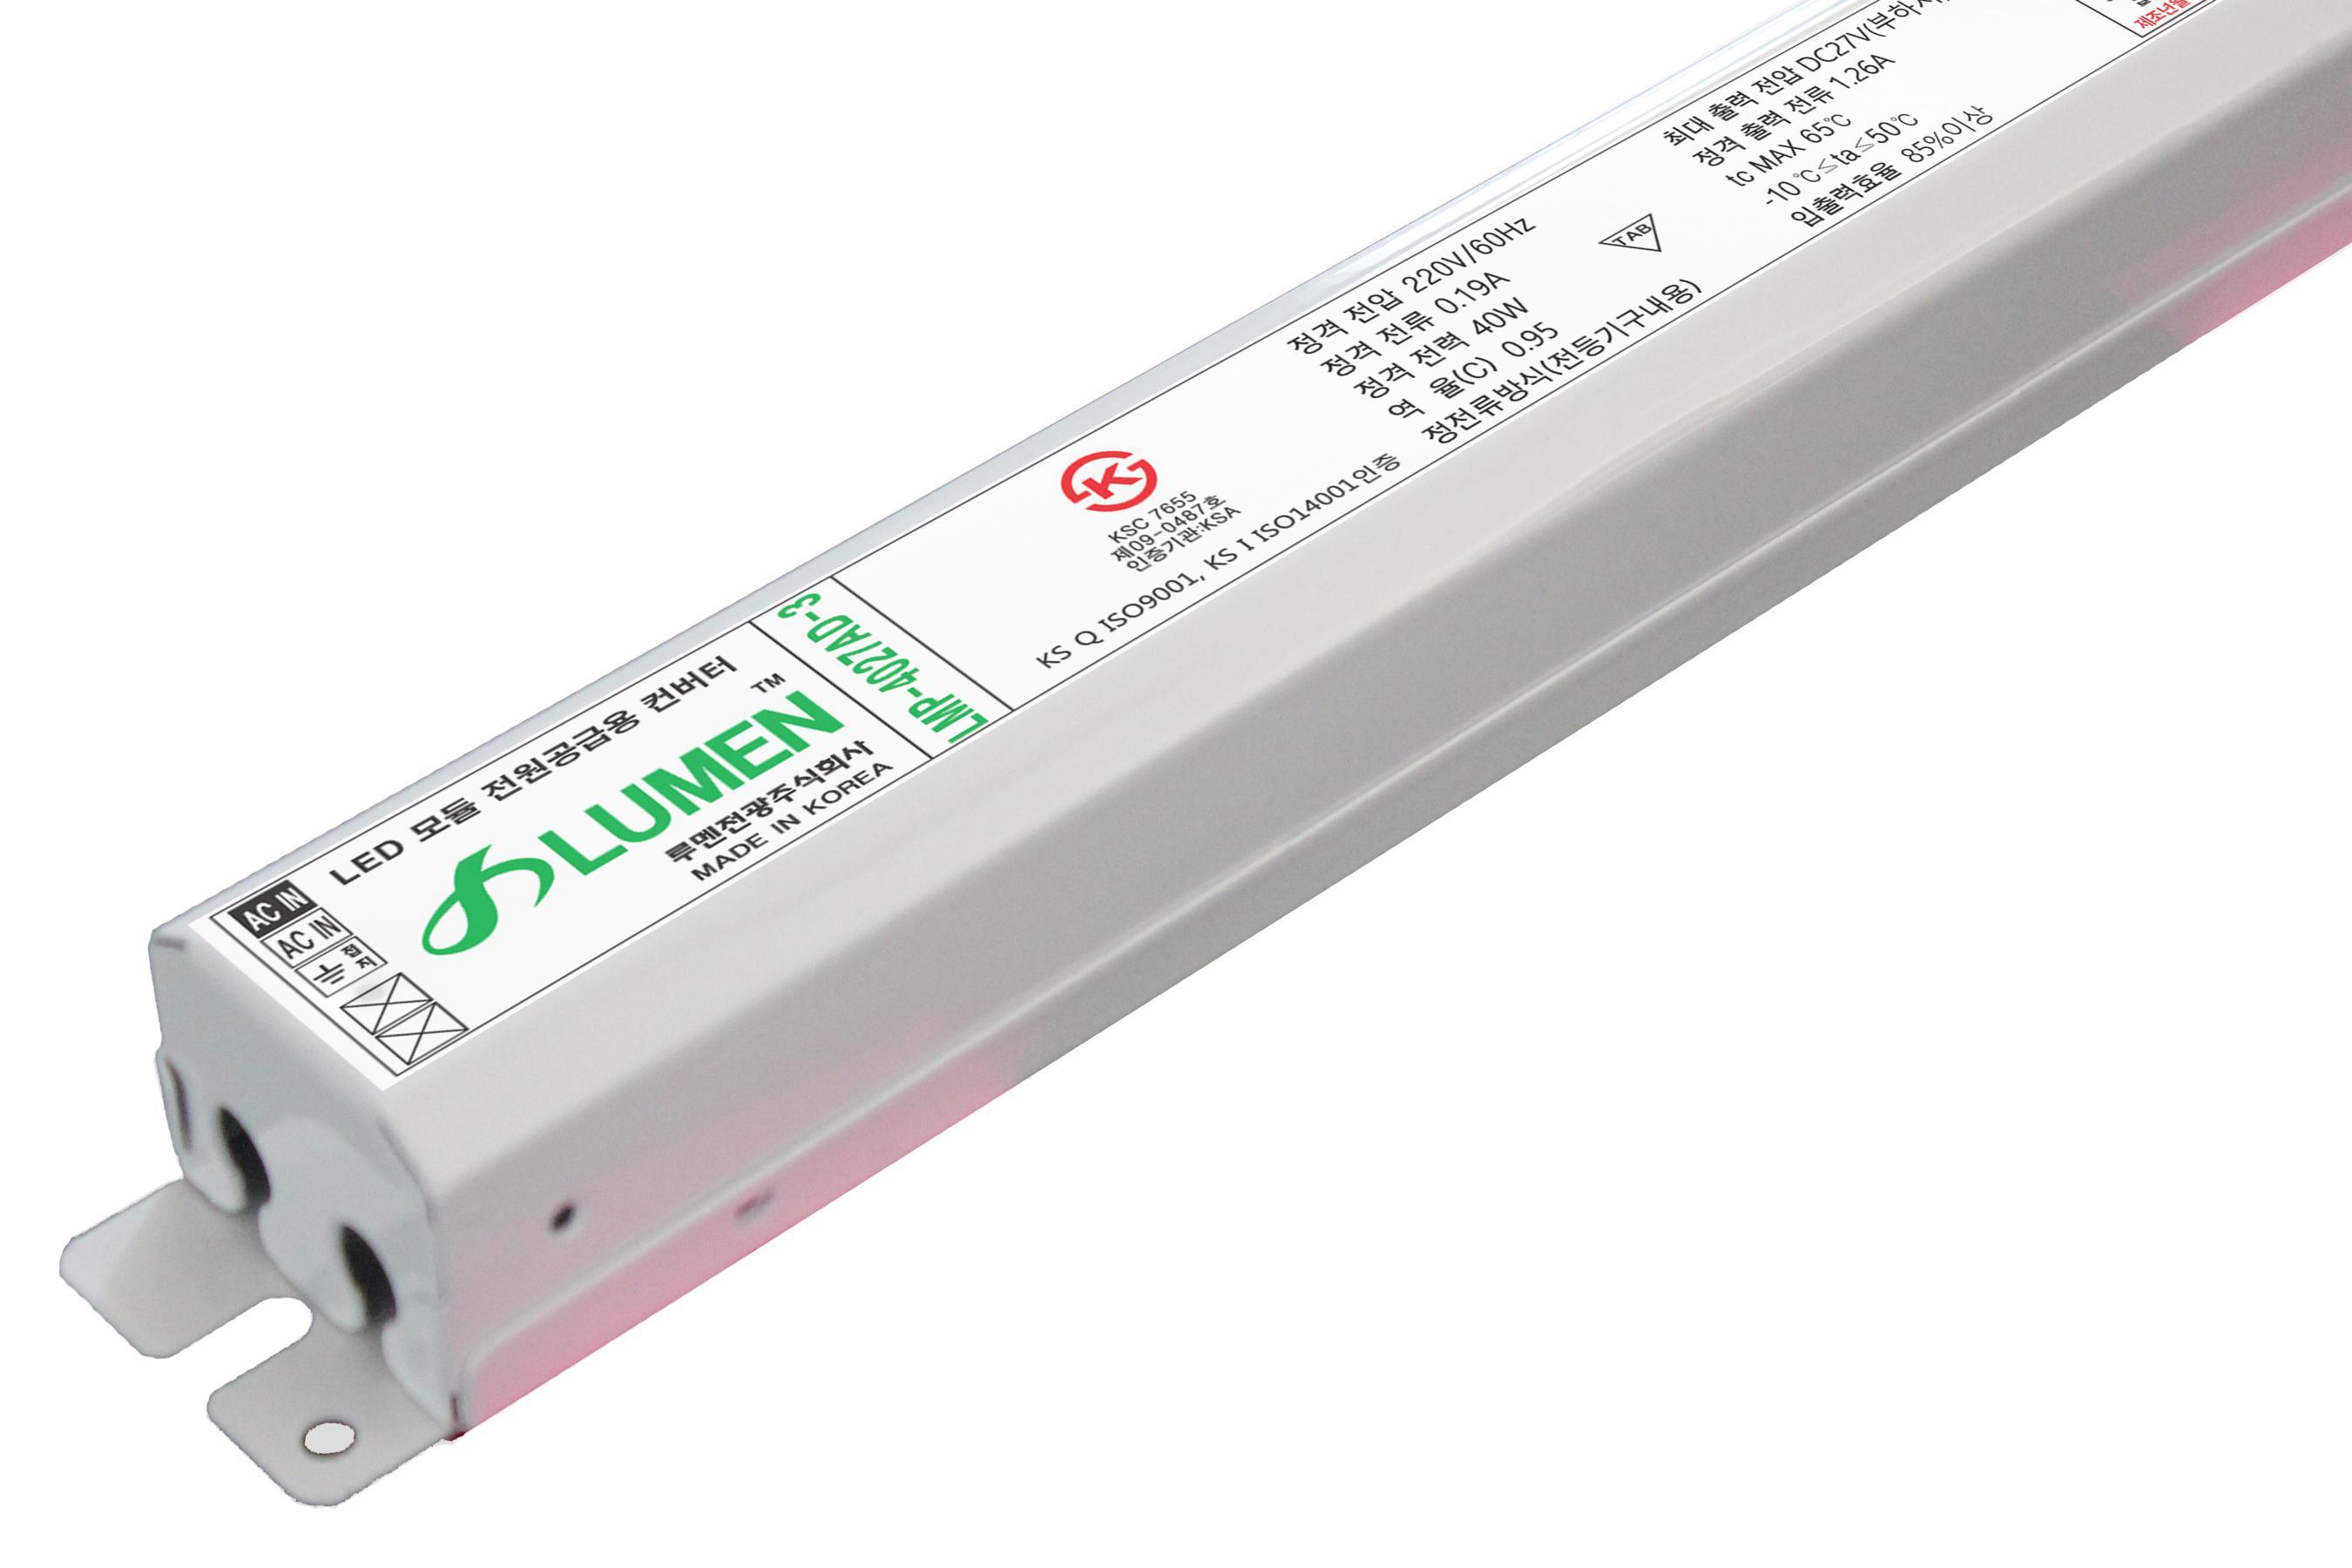 Lumen Power Saving's products